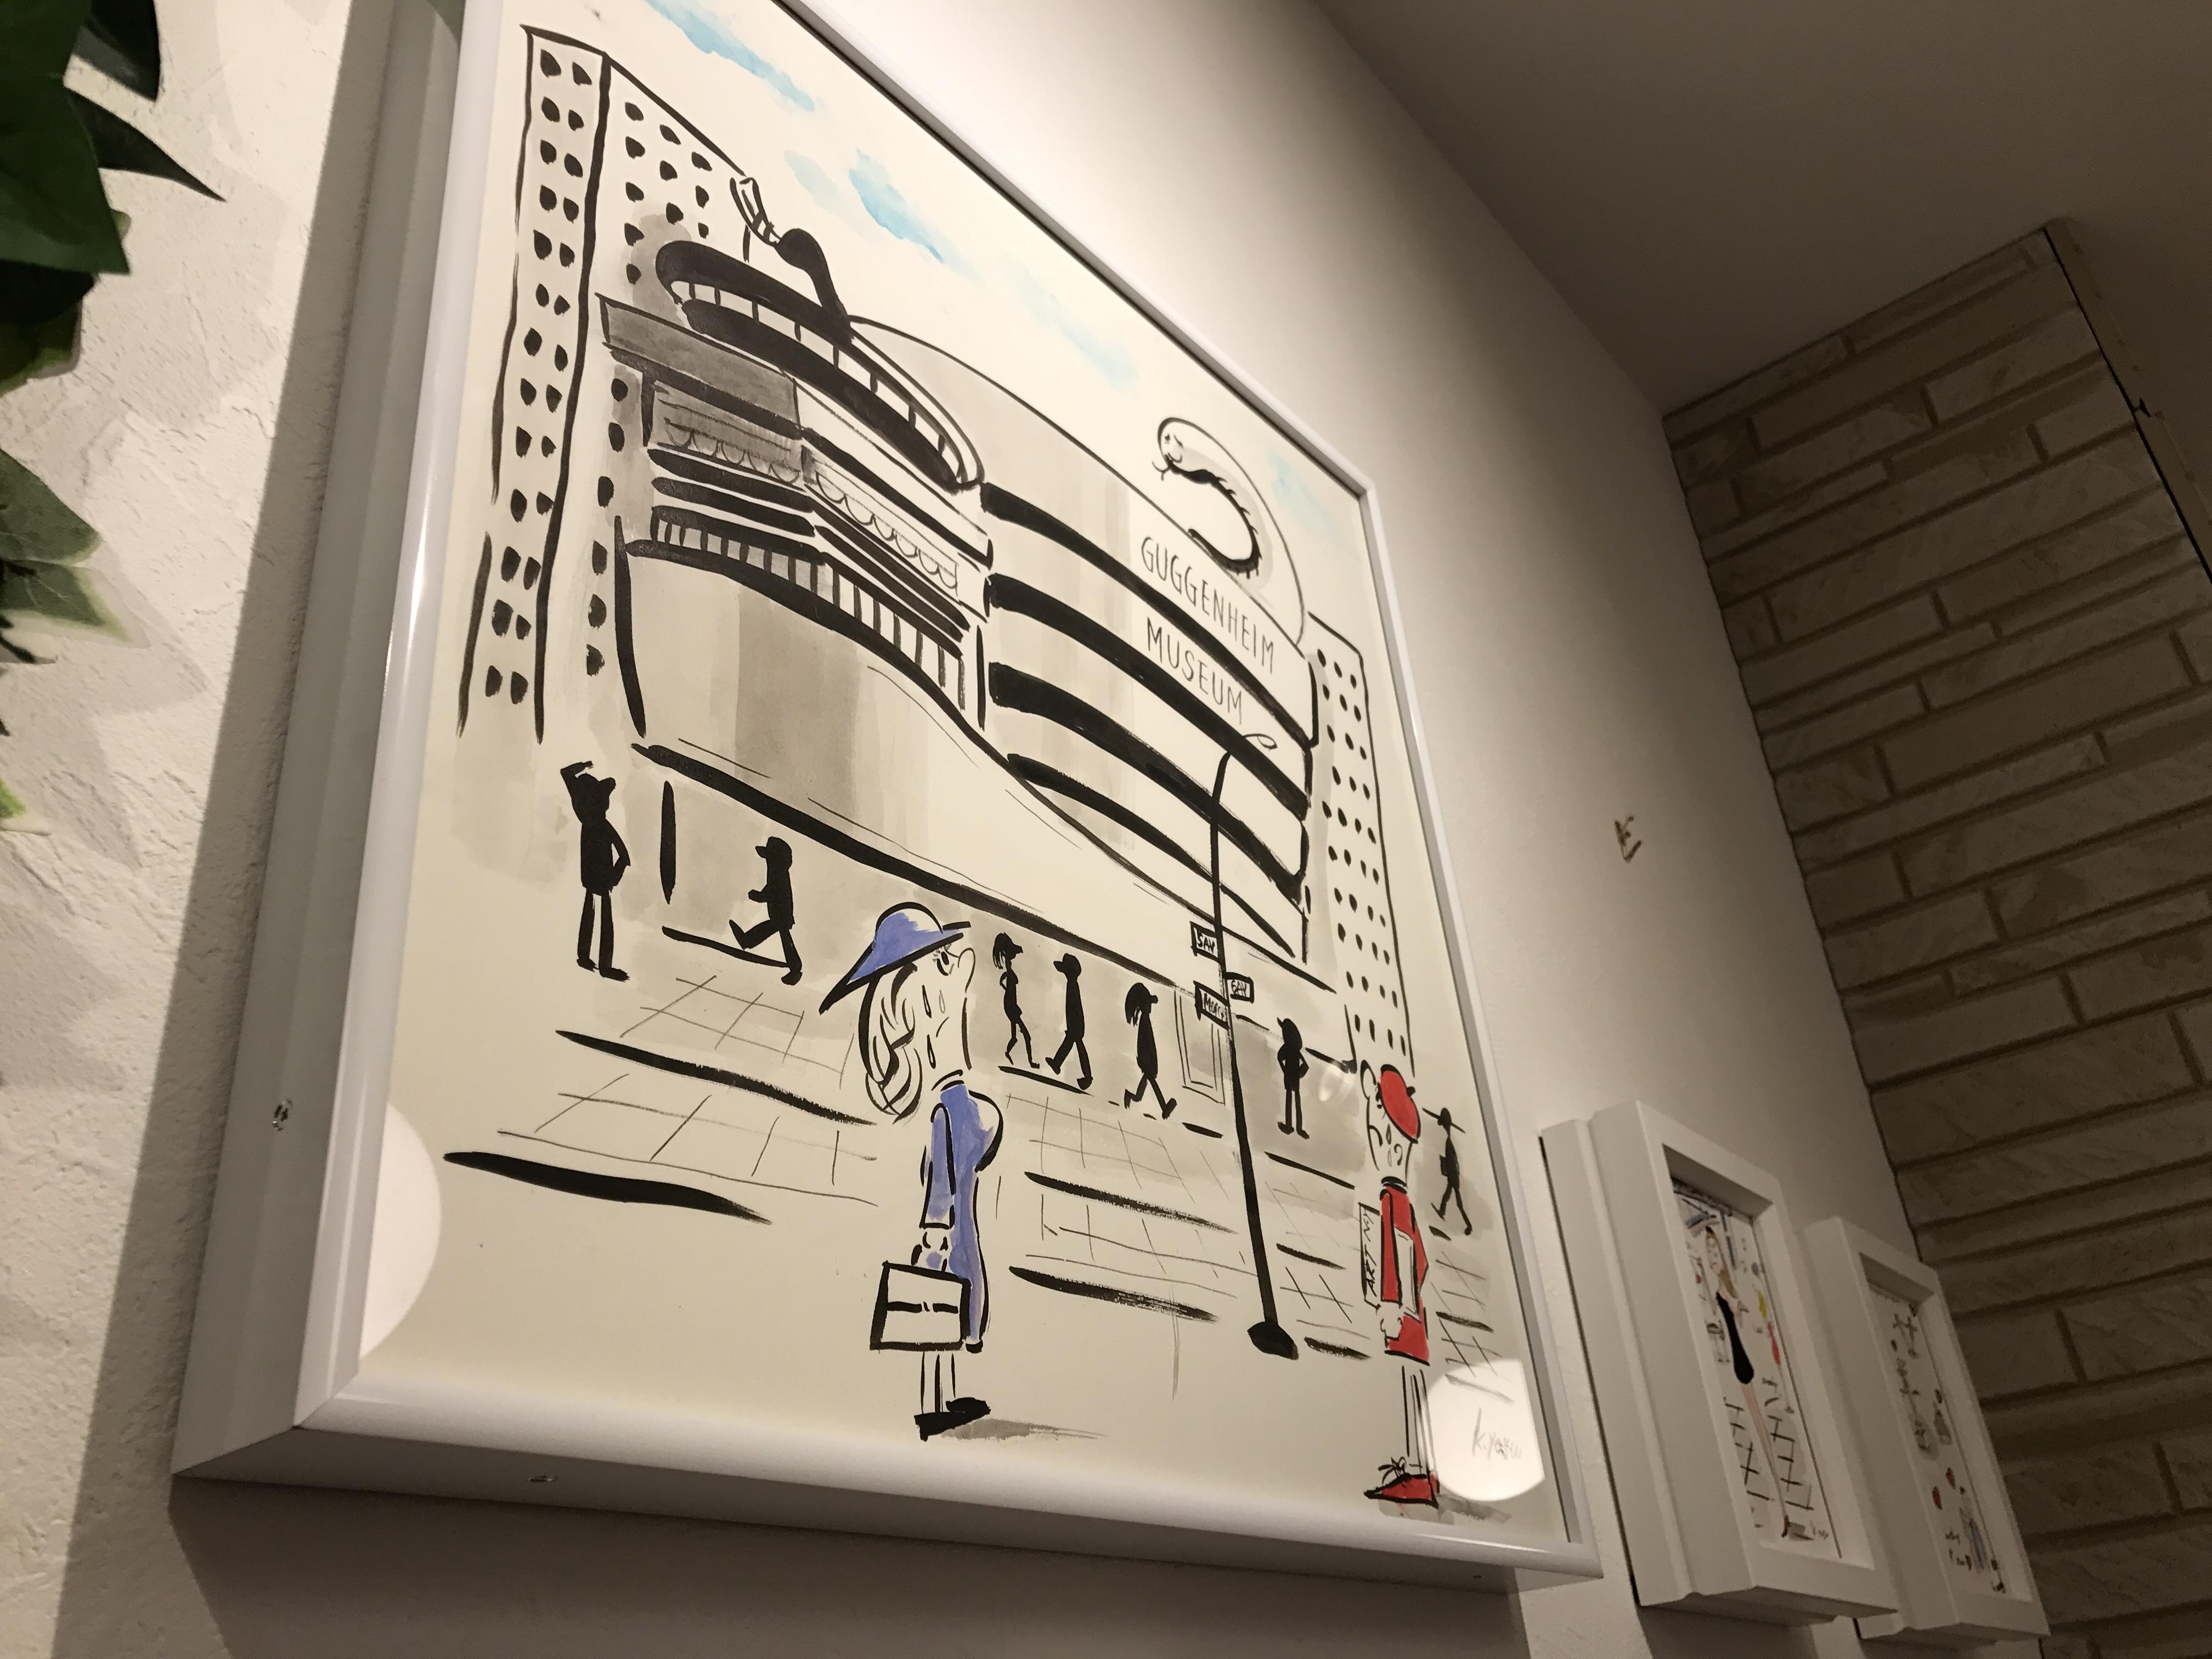 gram様に展示されている近藤さんのイラスト